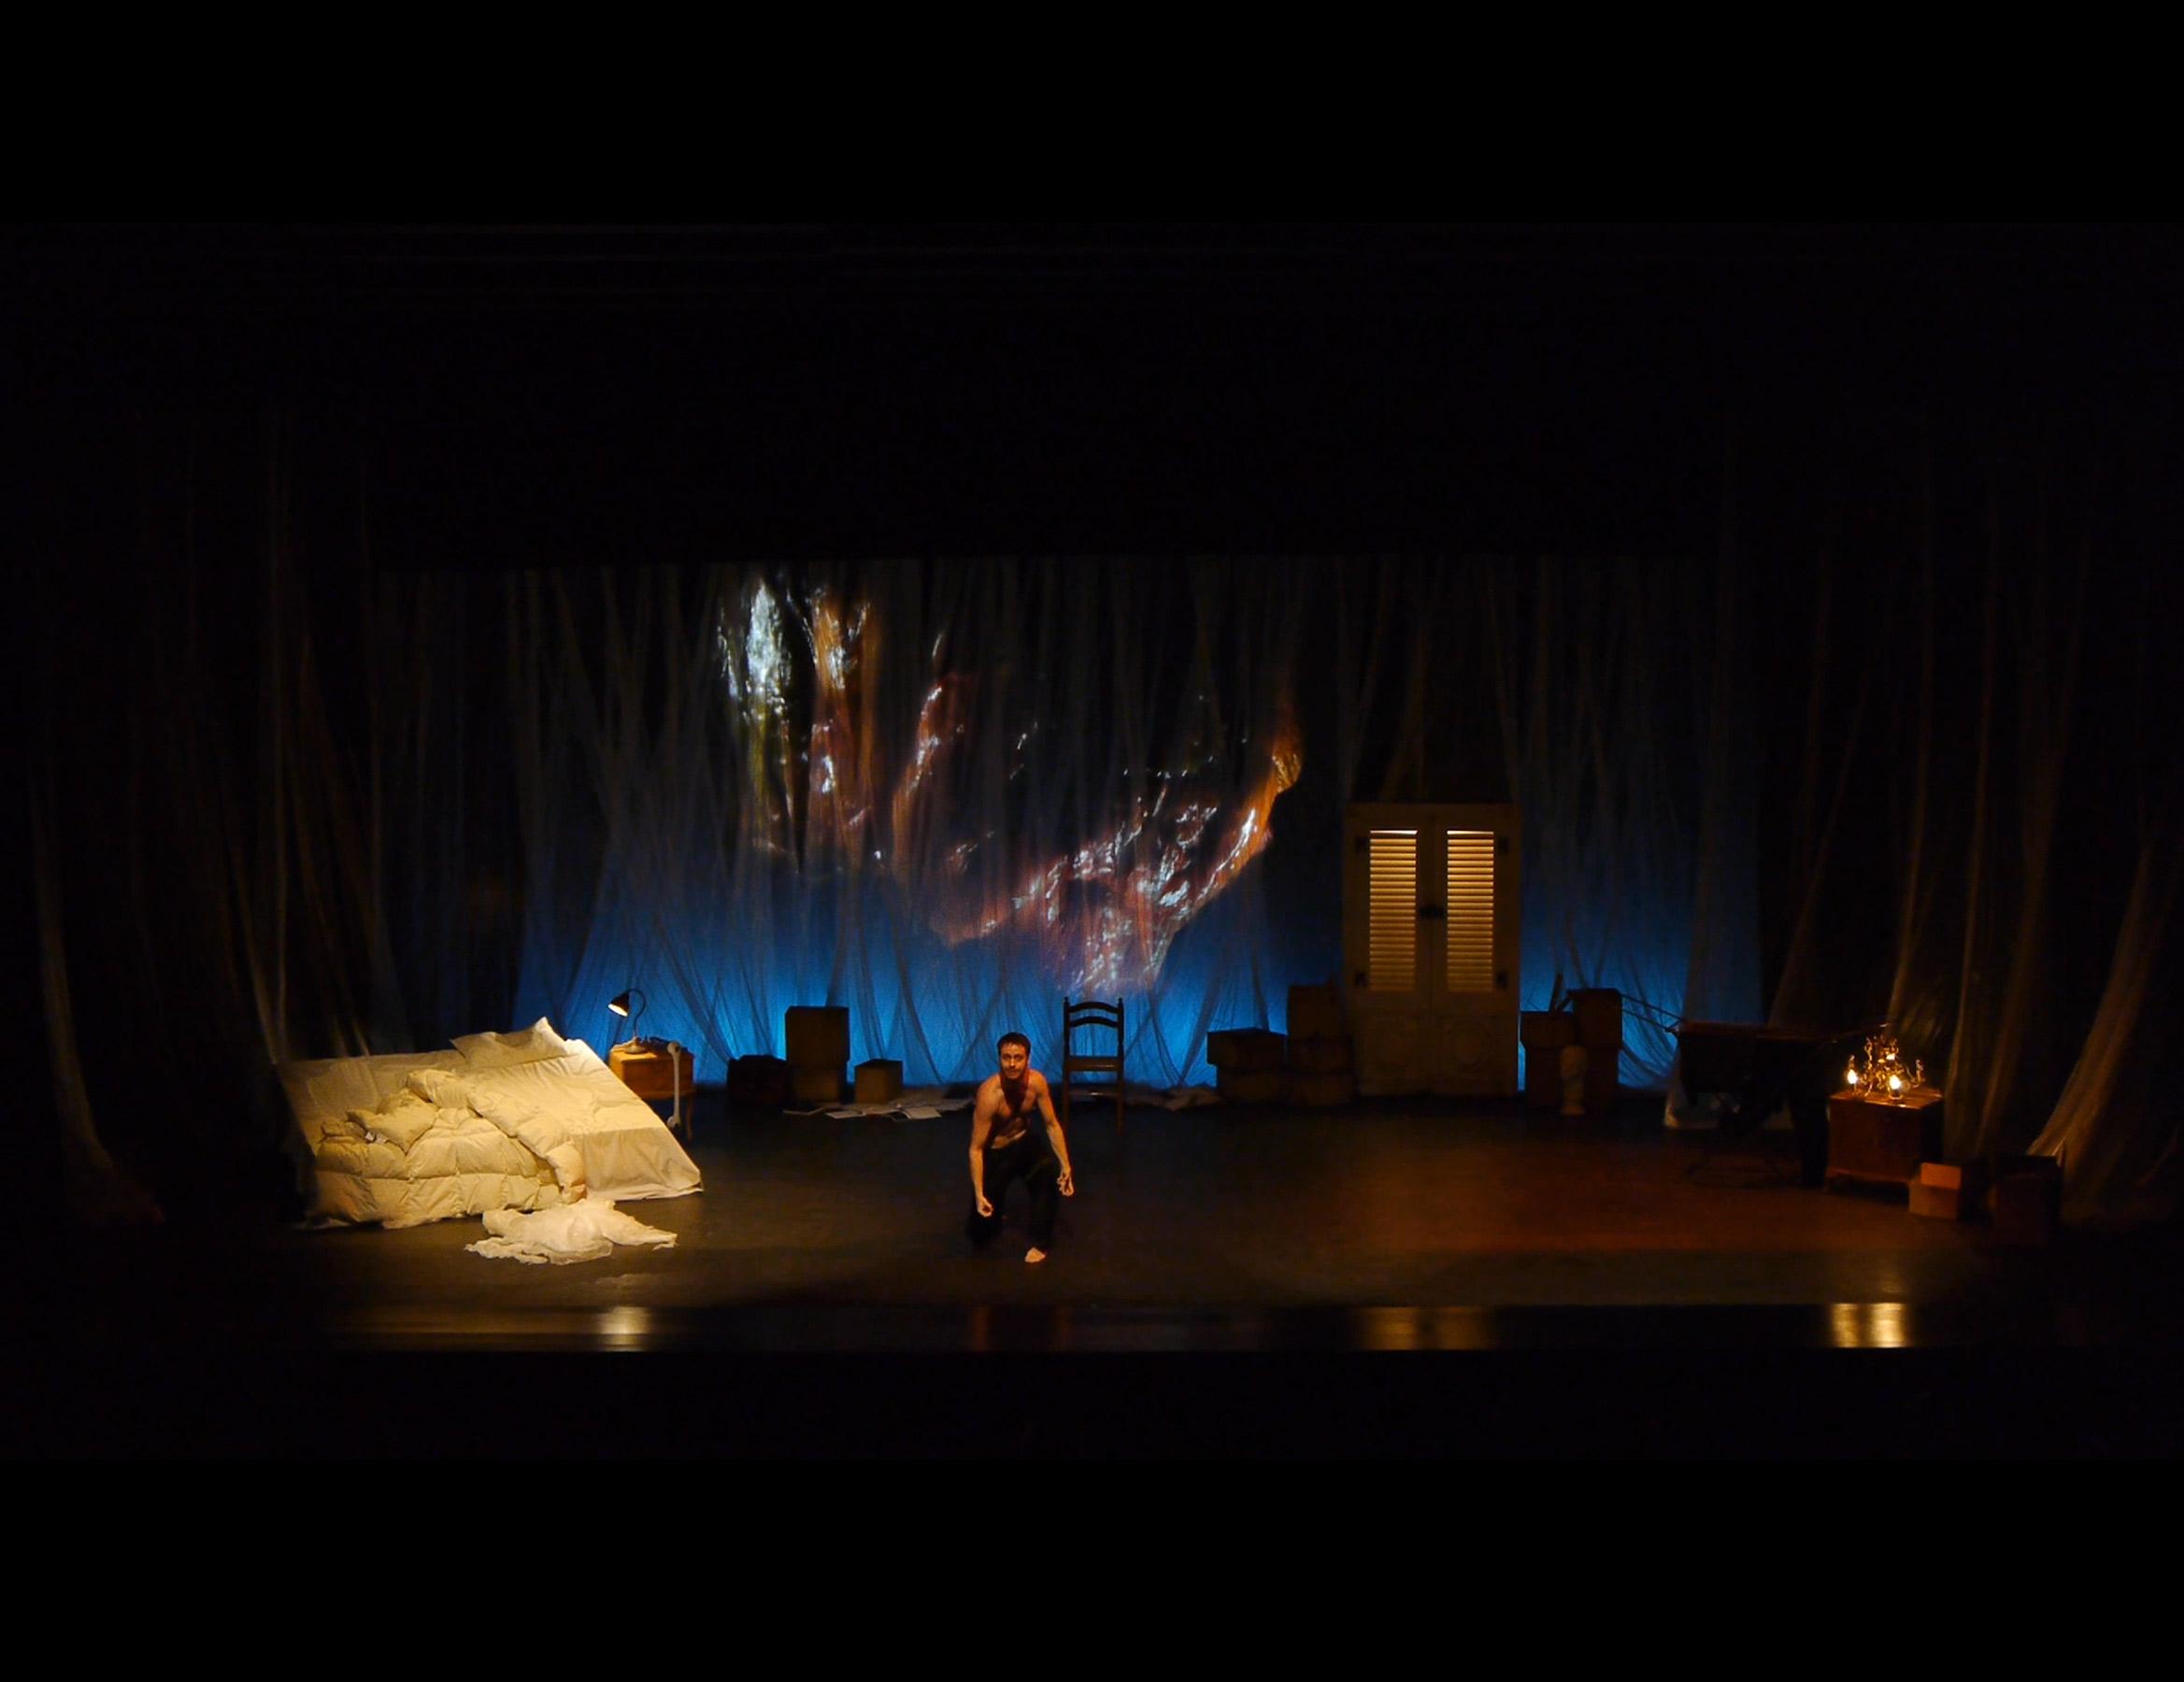 Hugo-Alonso-Estomago-Teatro-12.jpg